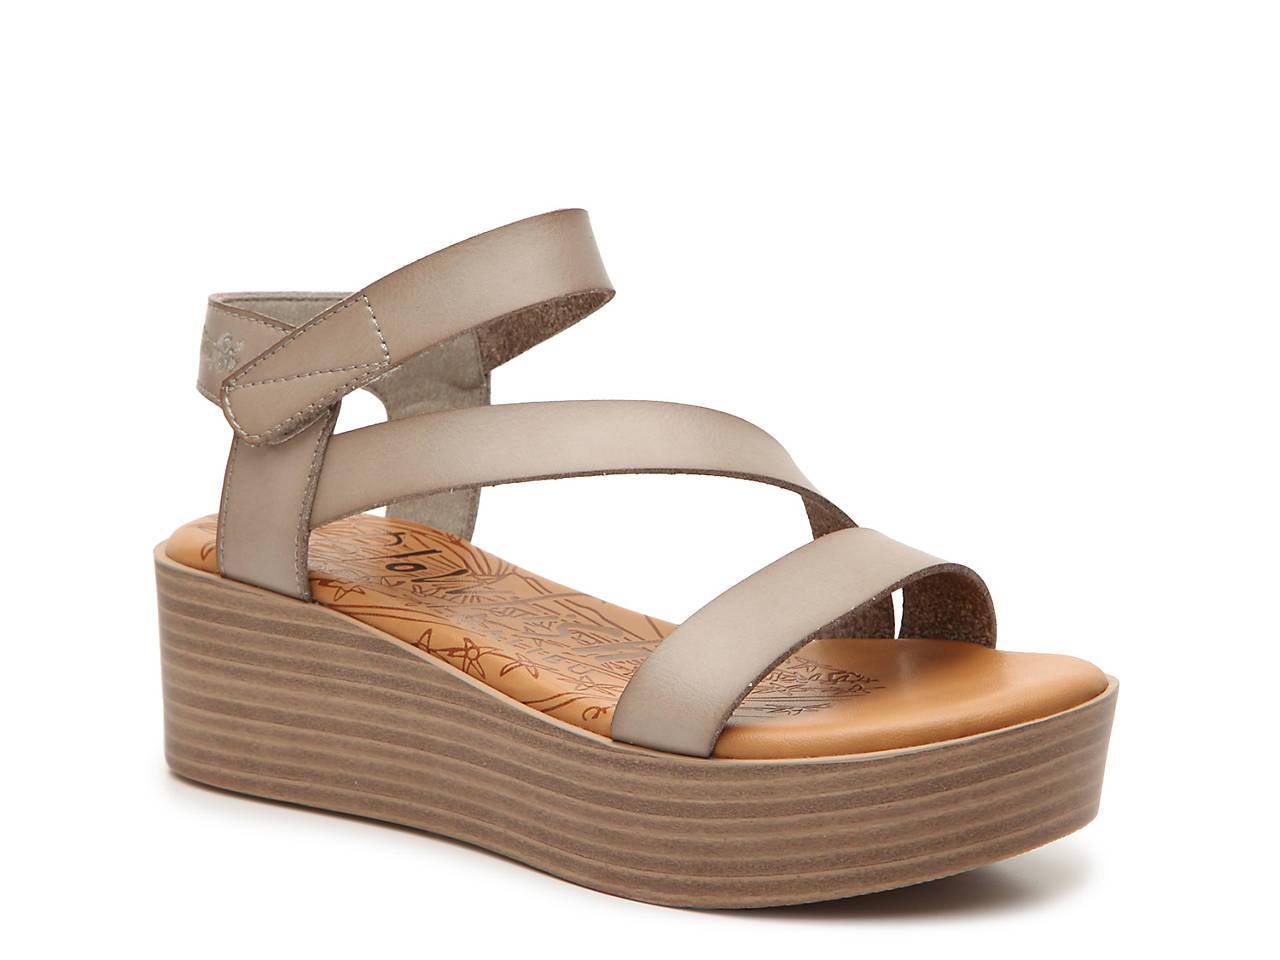 bc8c2d72a14 Lover Wedge Sandal